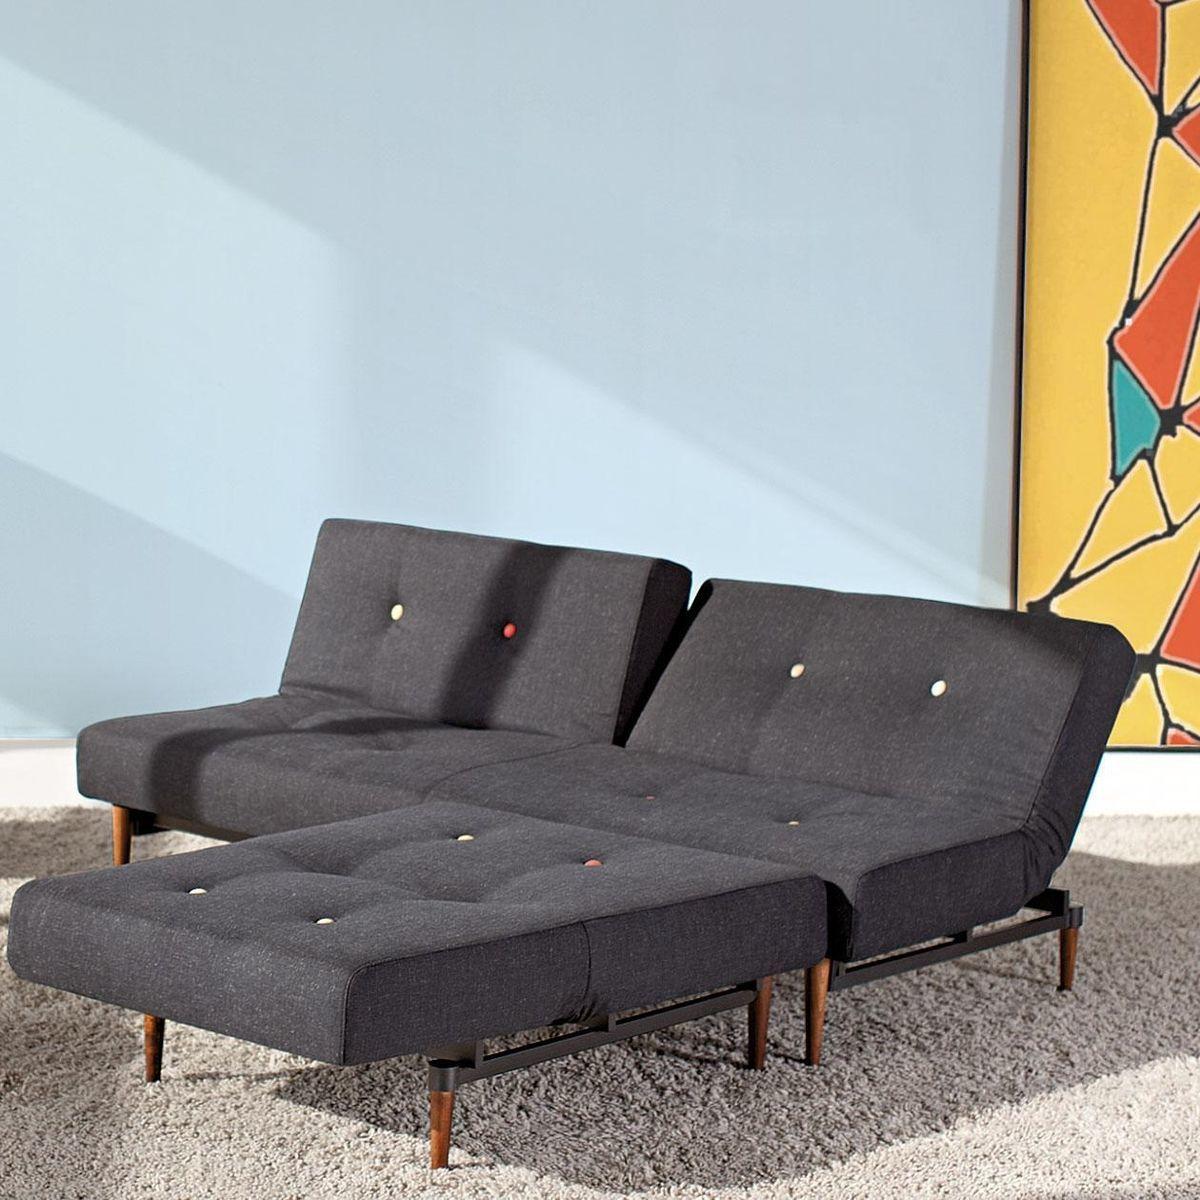 fiftynine sofa bed innovation. Black Bedroom Furniture Sets. Home Design Ideas